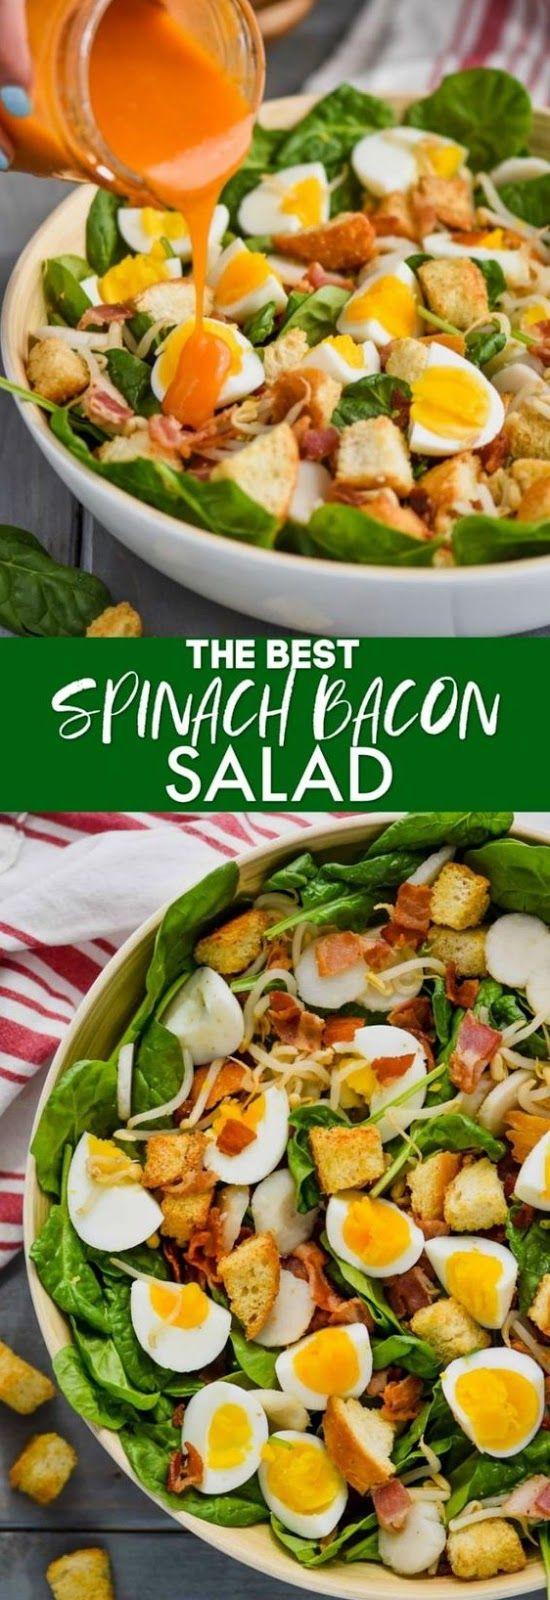 Spinach Bacon Salad salad Bacon salad, Spinach salad